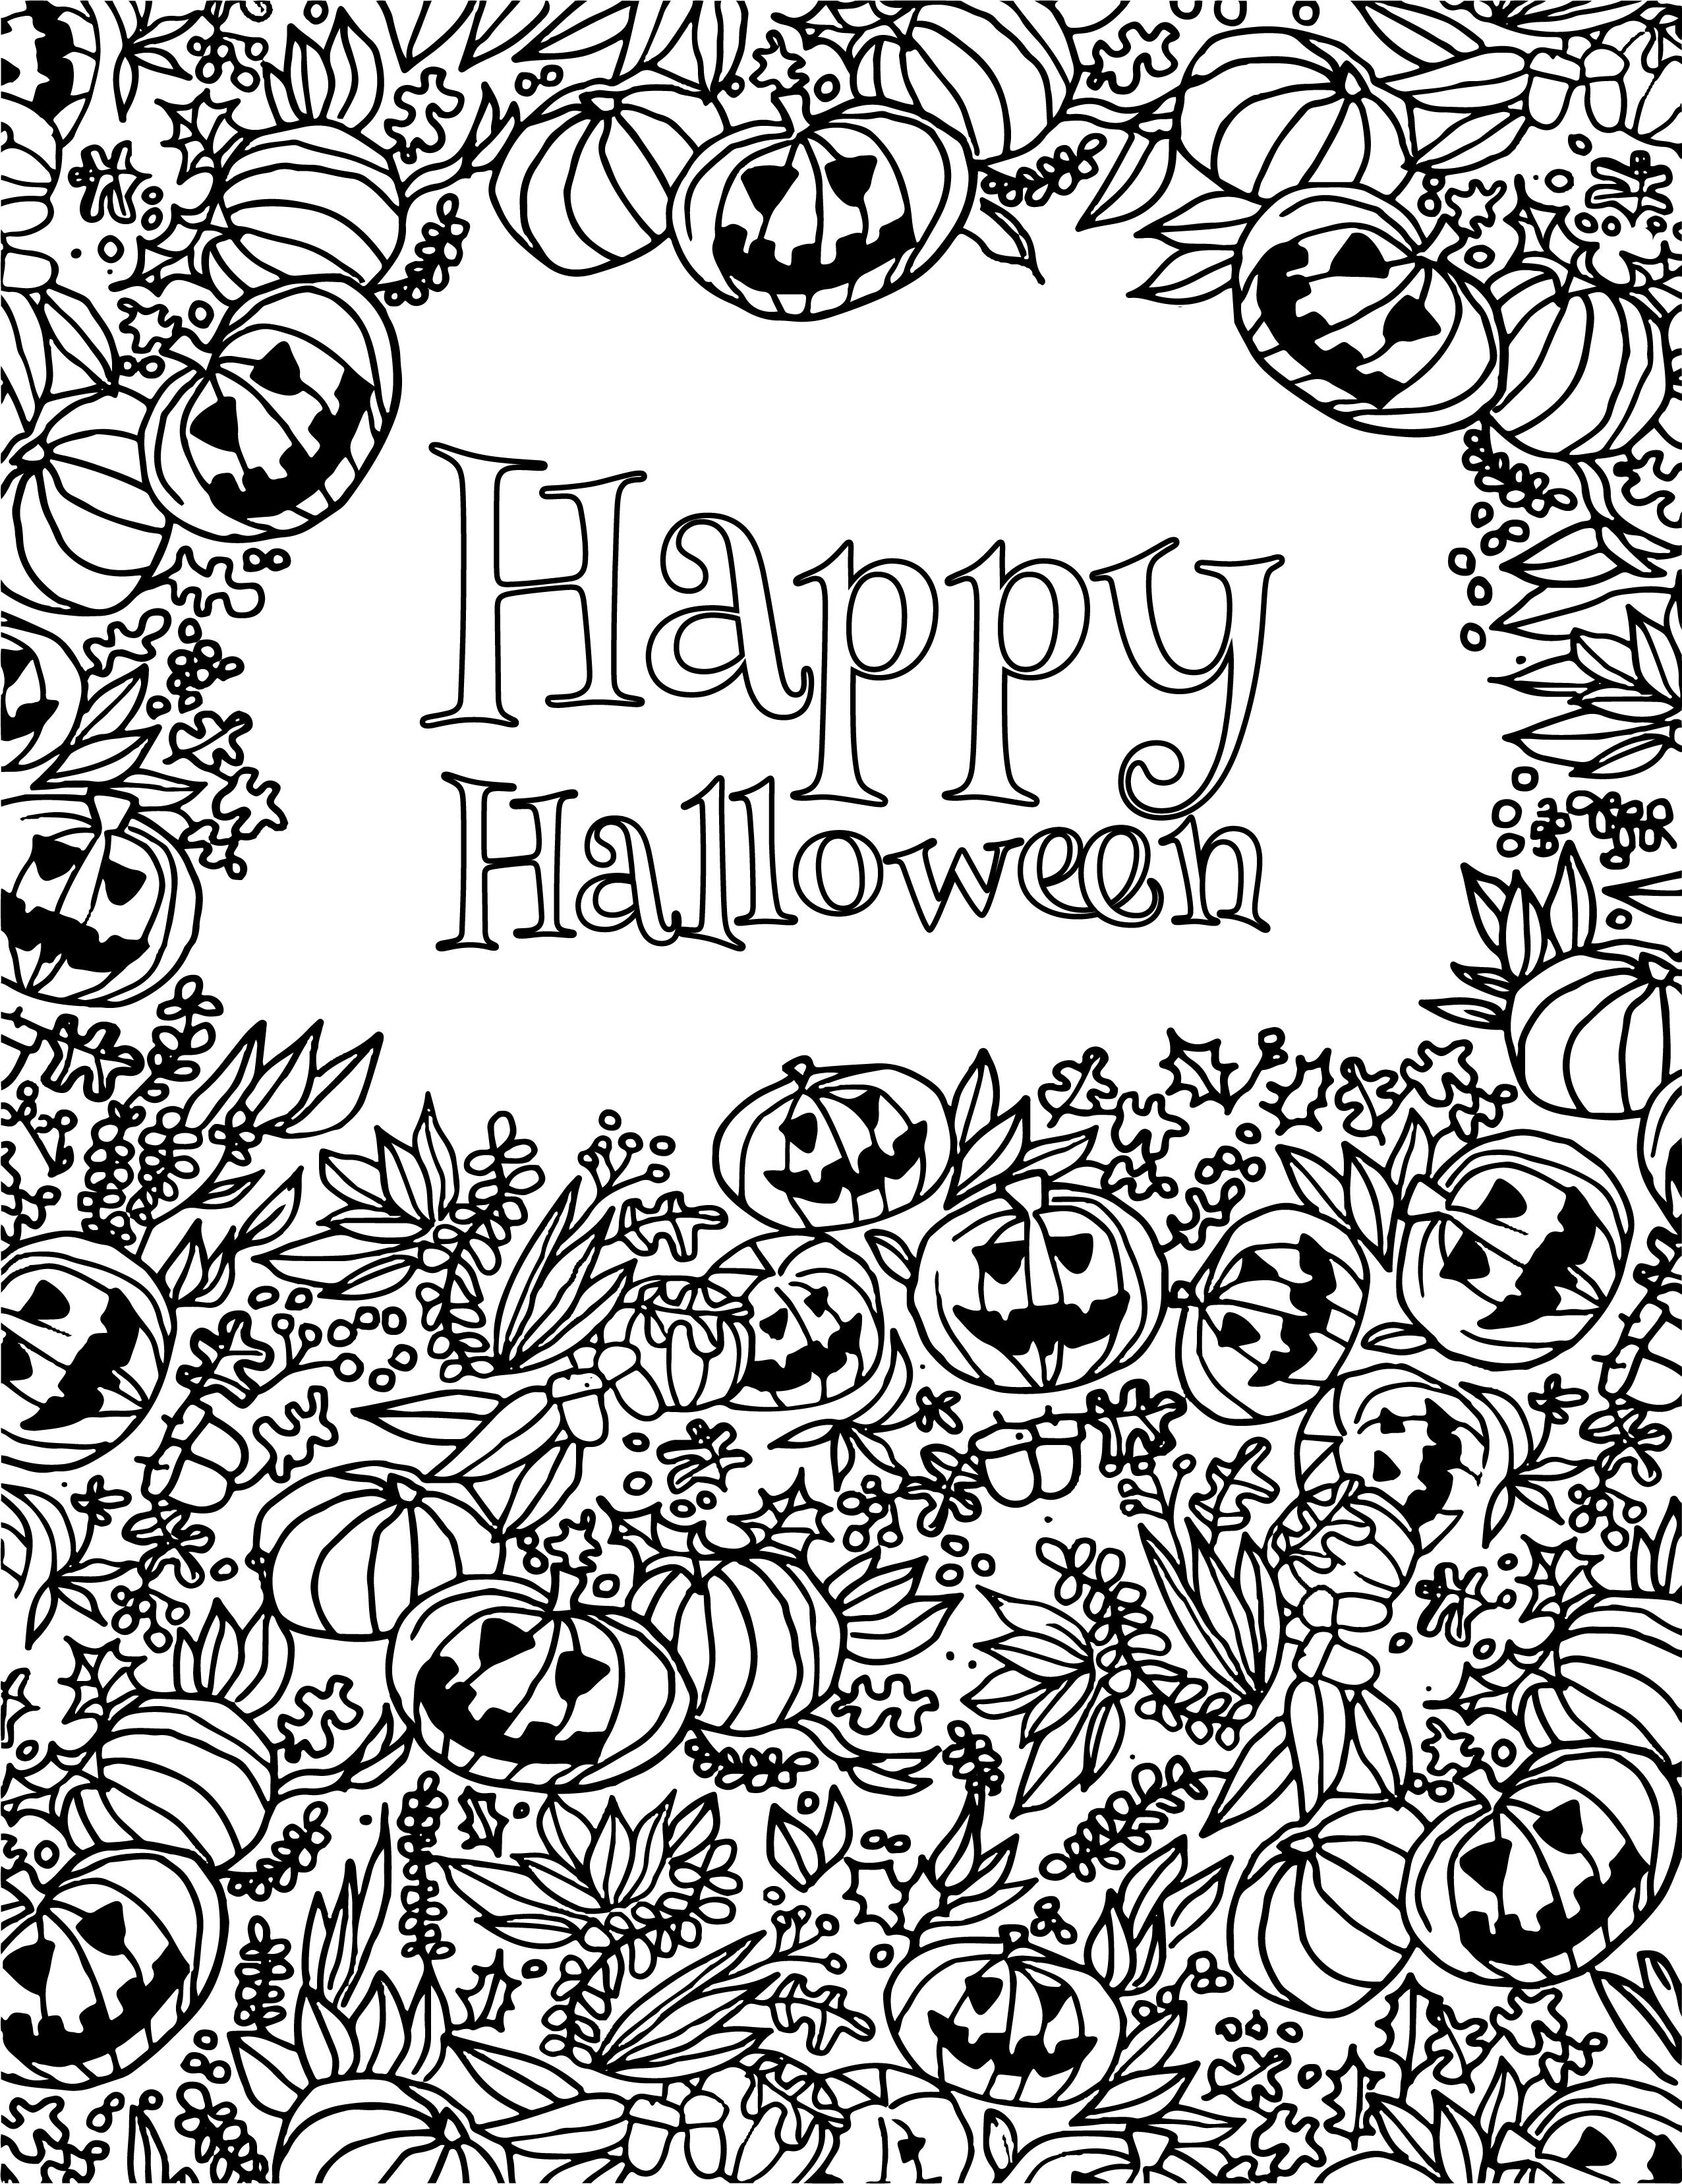 Joyeux Halloween Party coloriage 31 octobre - Artherapie.ca